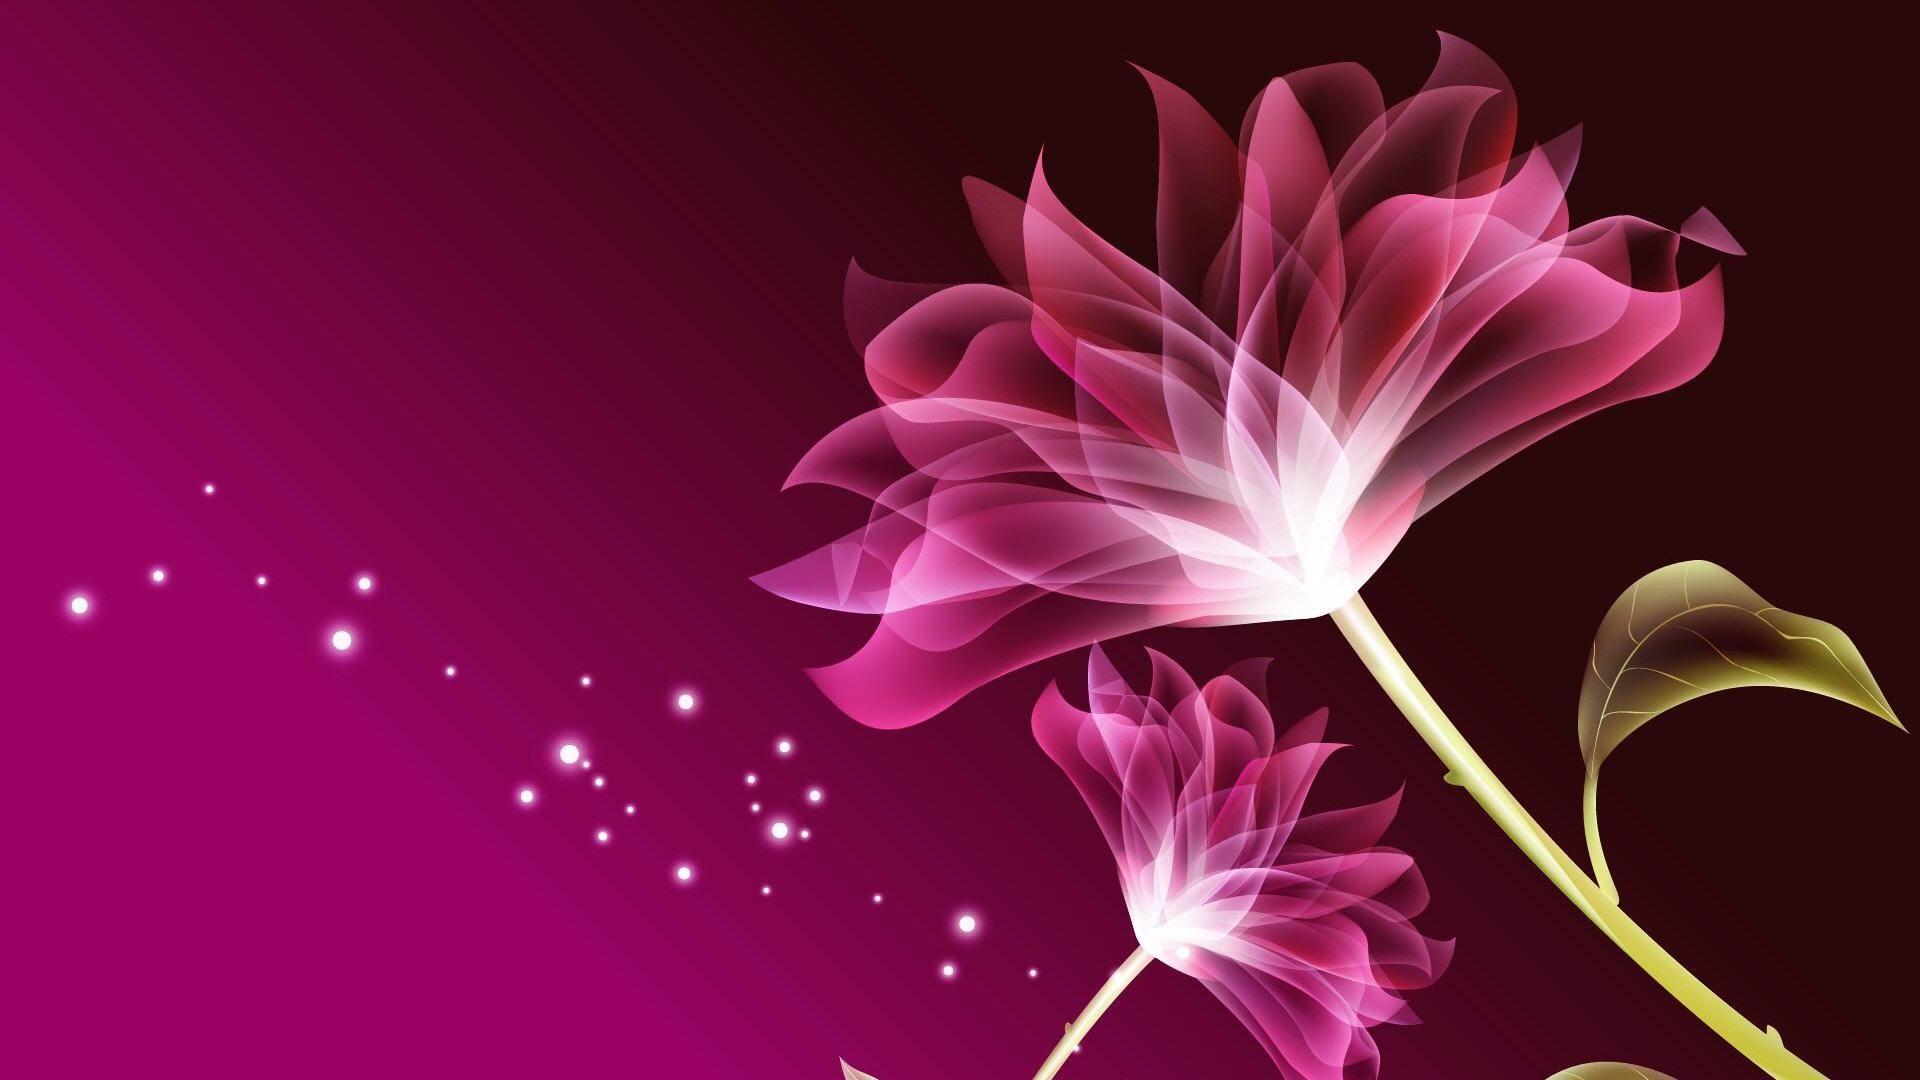 Beautiful Flowers Wallpaper Flower Images Wallpapers Pink Flowers Wallpaper Beautiful Flowers Wallpapers